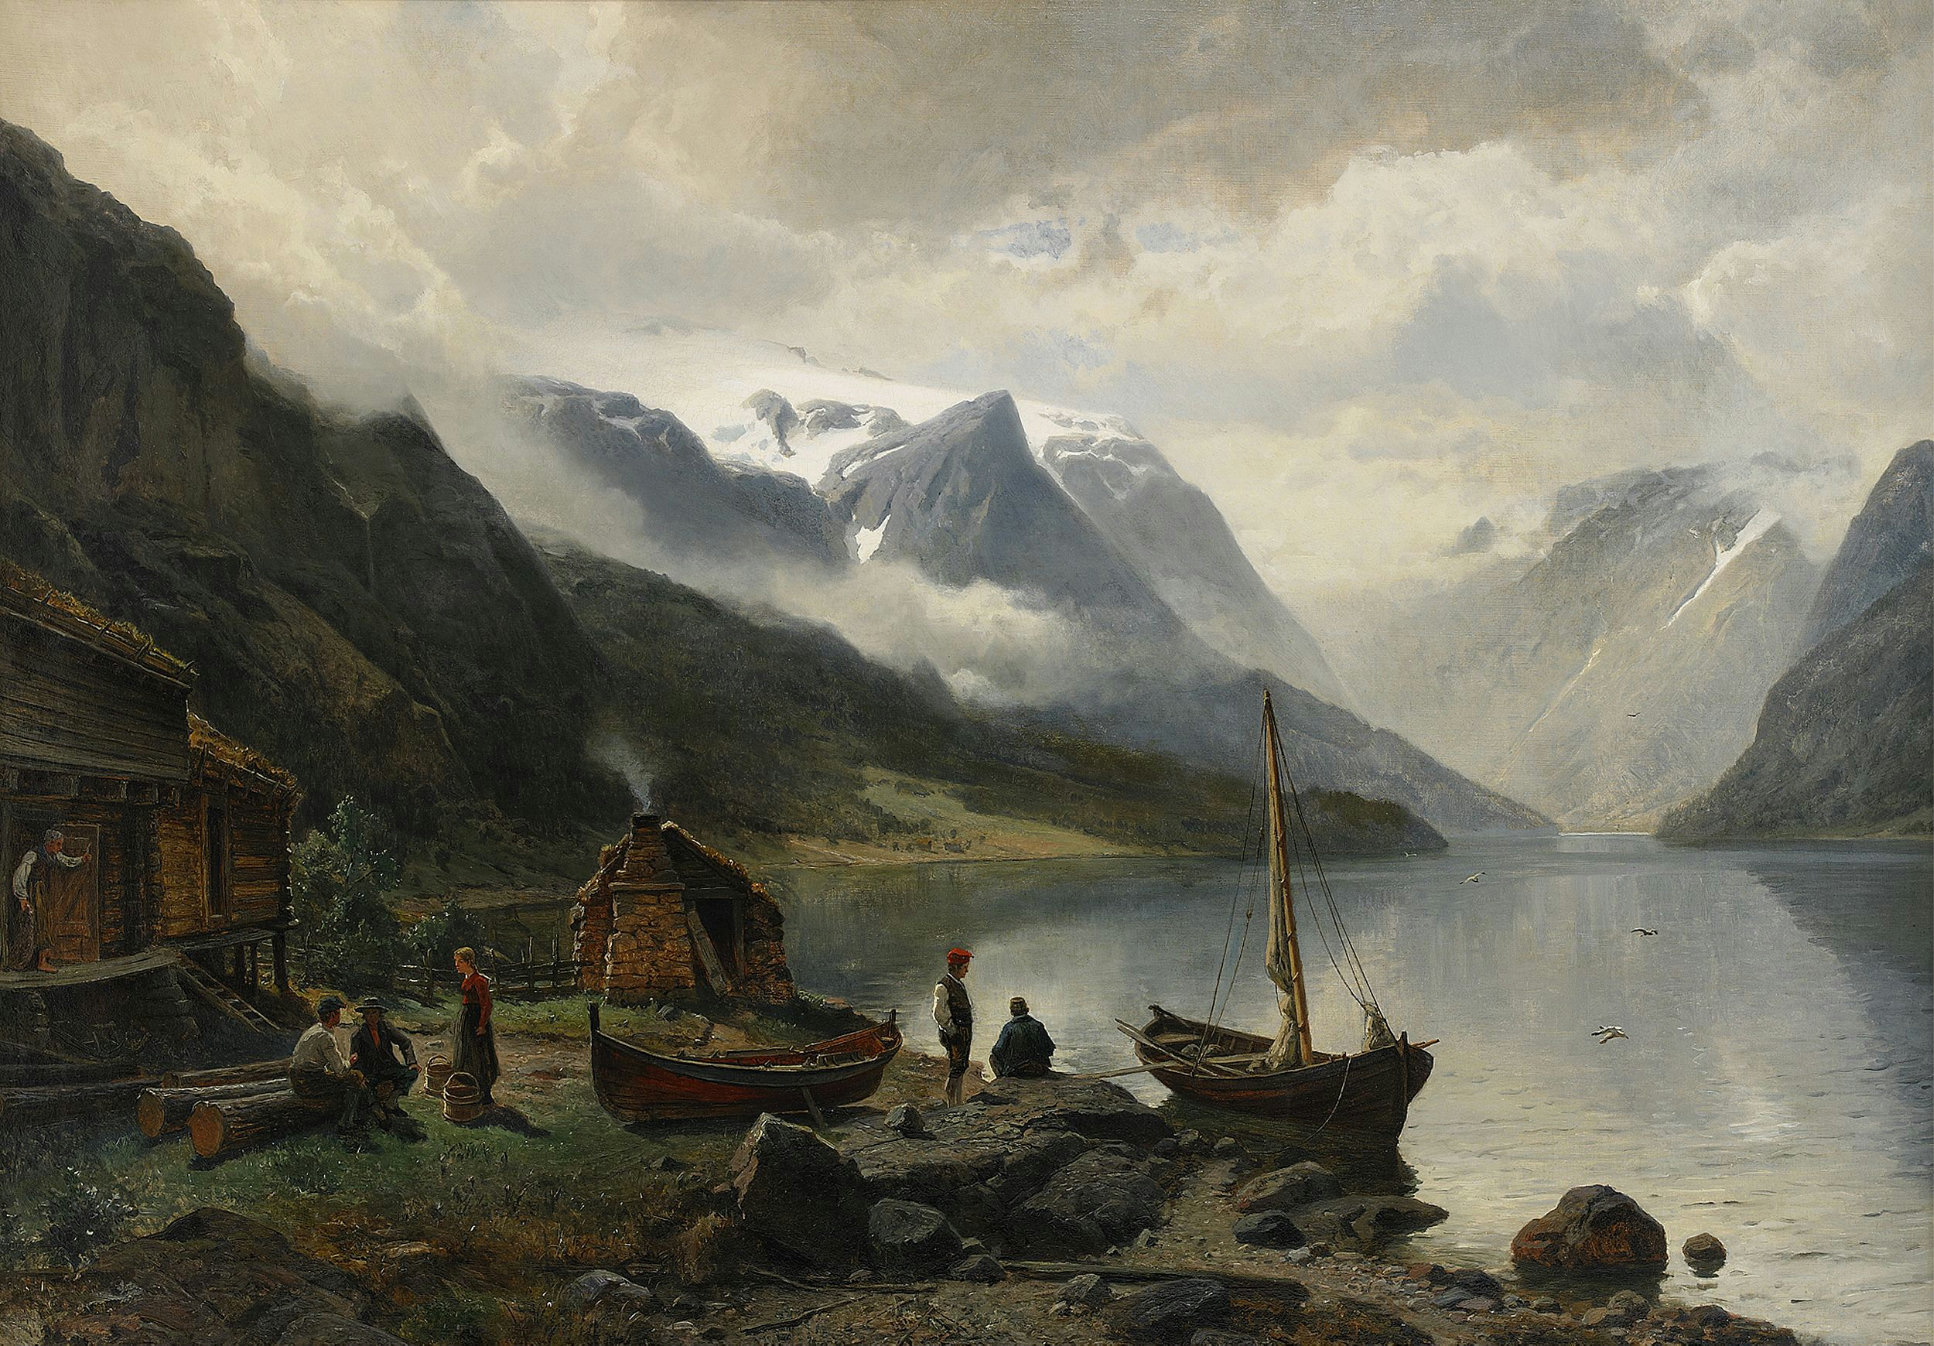 1934x1346 Художник Johan Edvard Bergh (Sweden, 1828-1880) (18 фото)